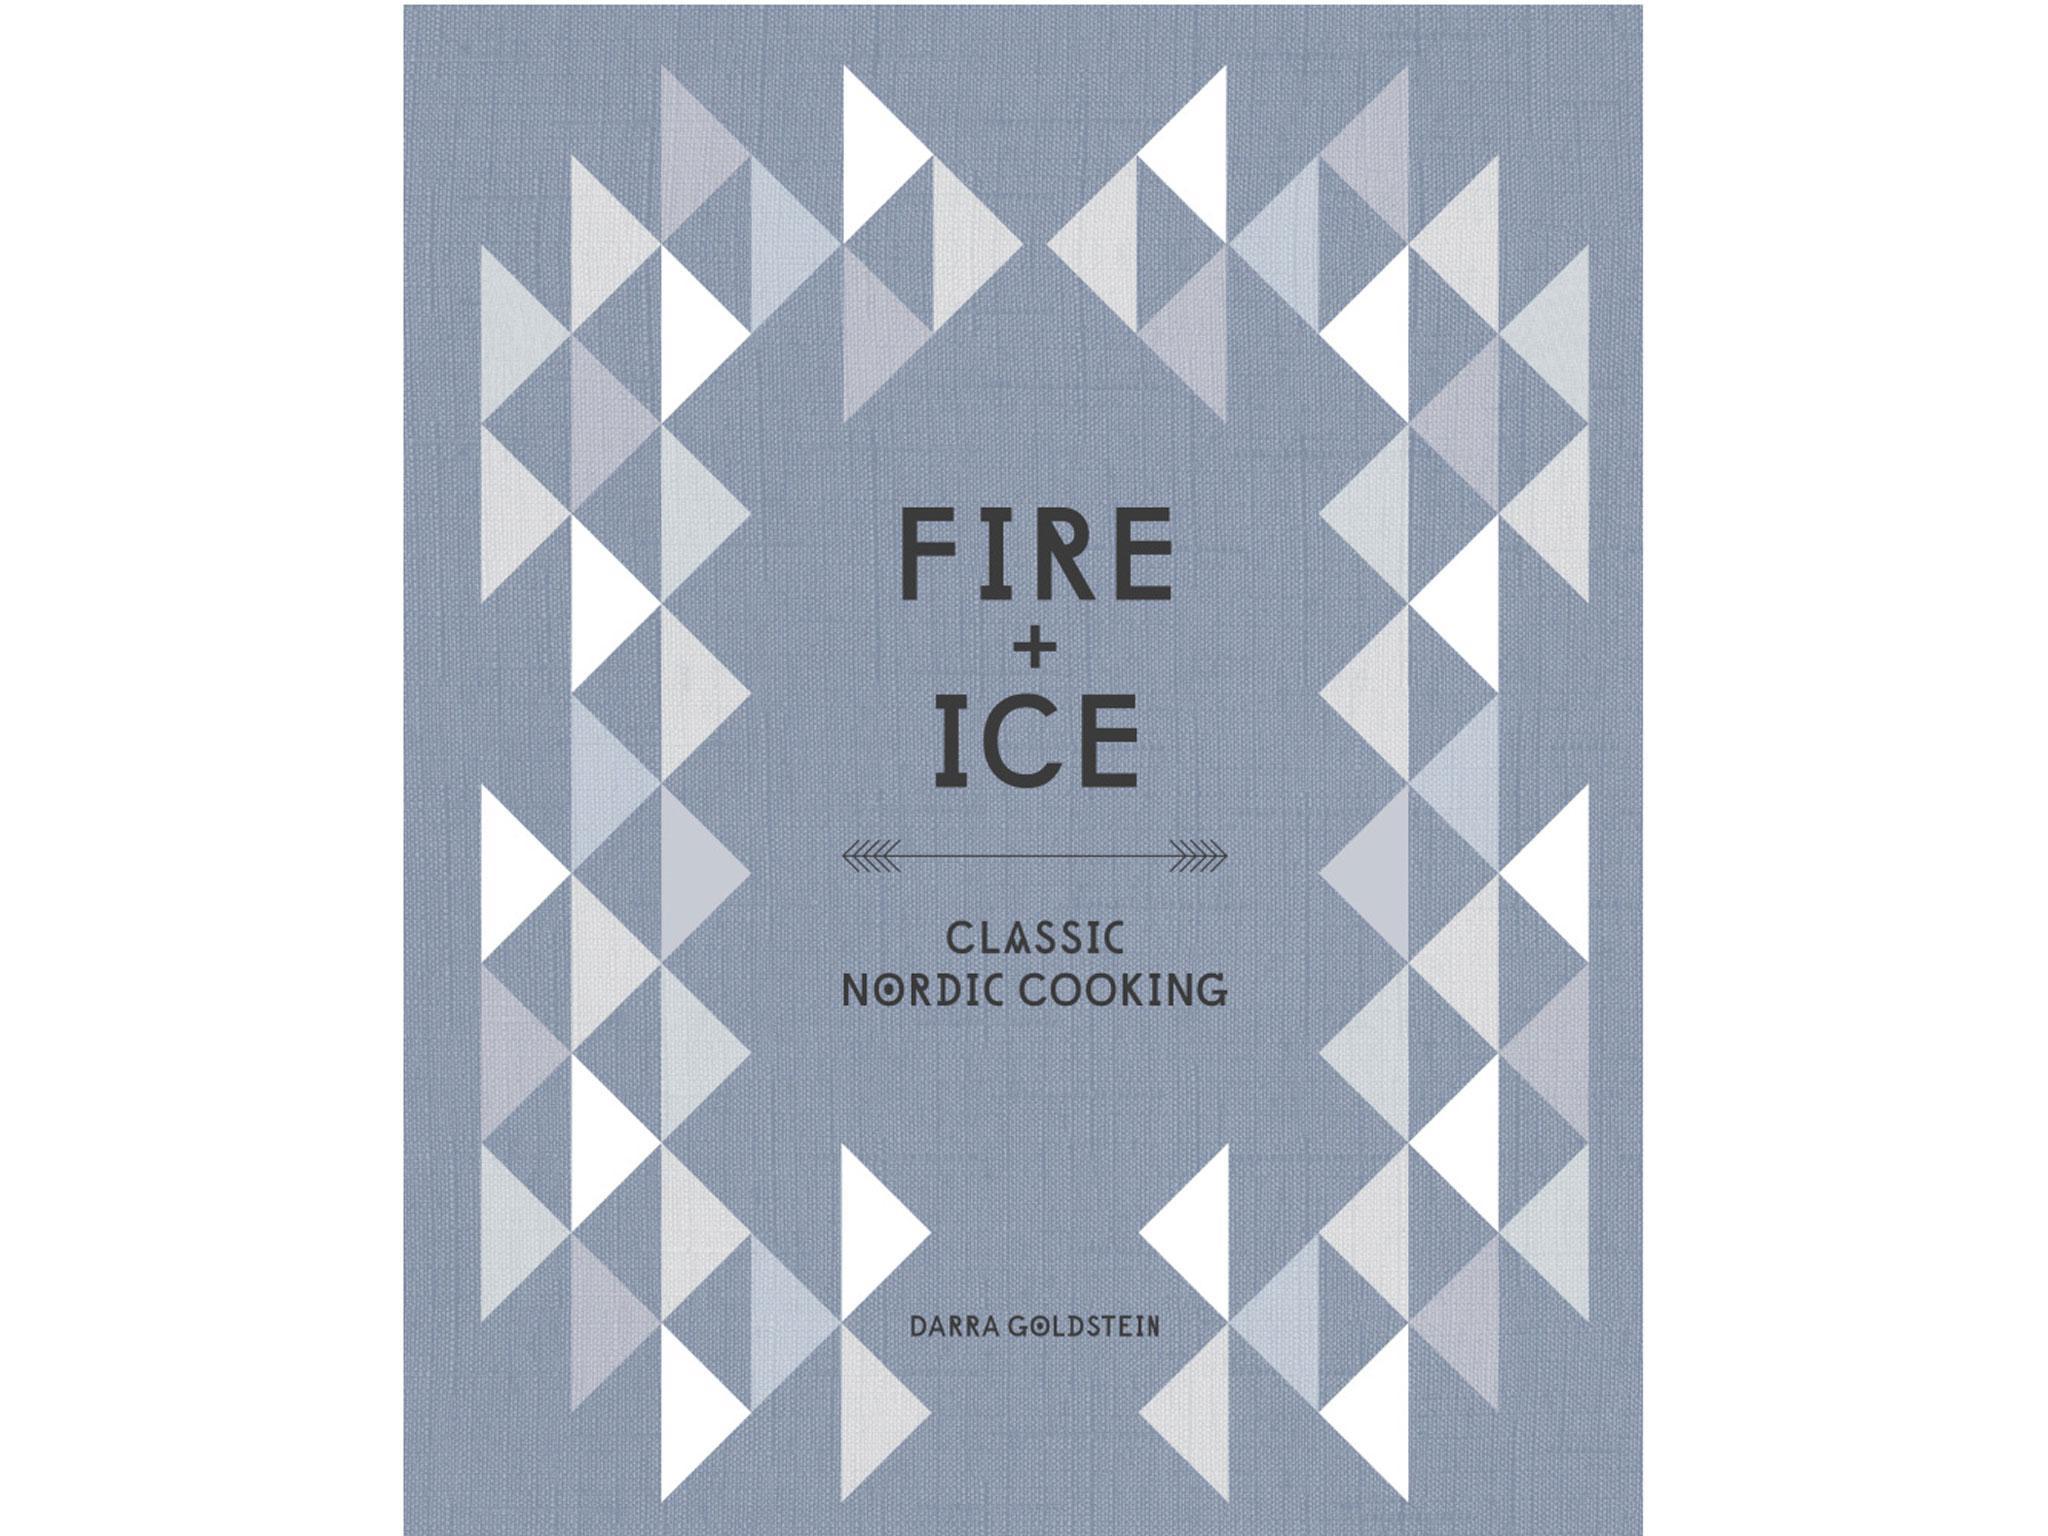 10 best Scandinavian cookbooks | The Independent